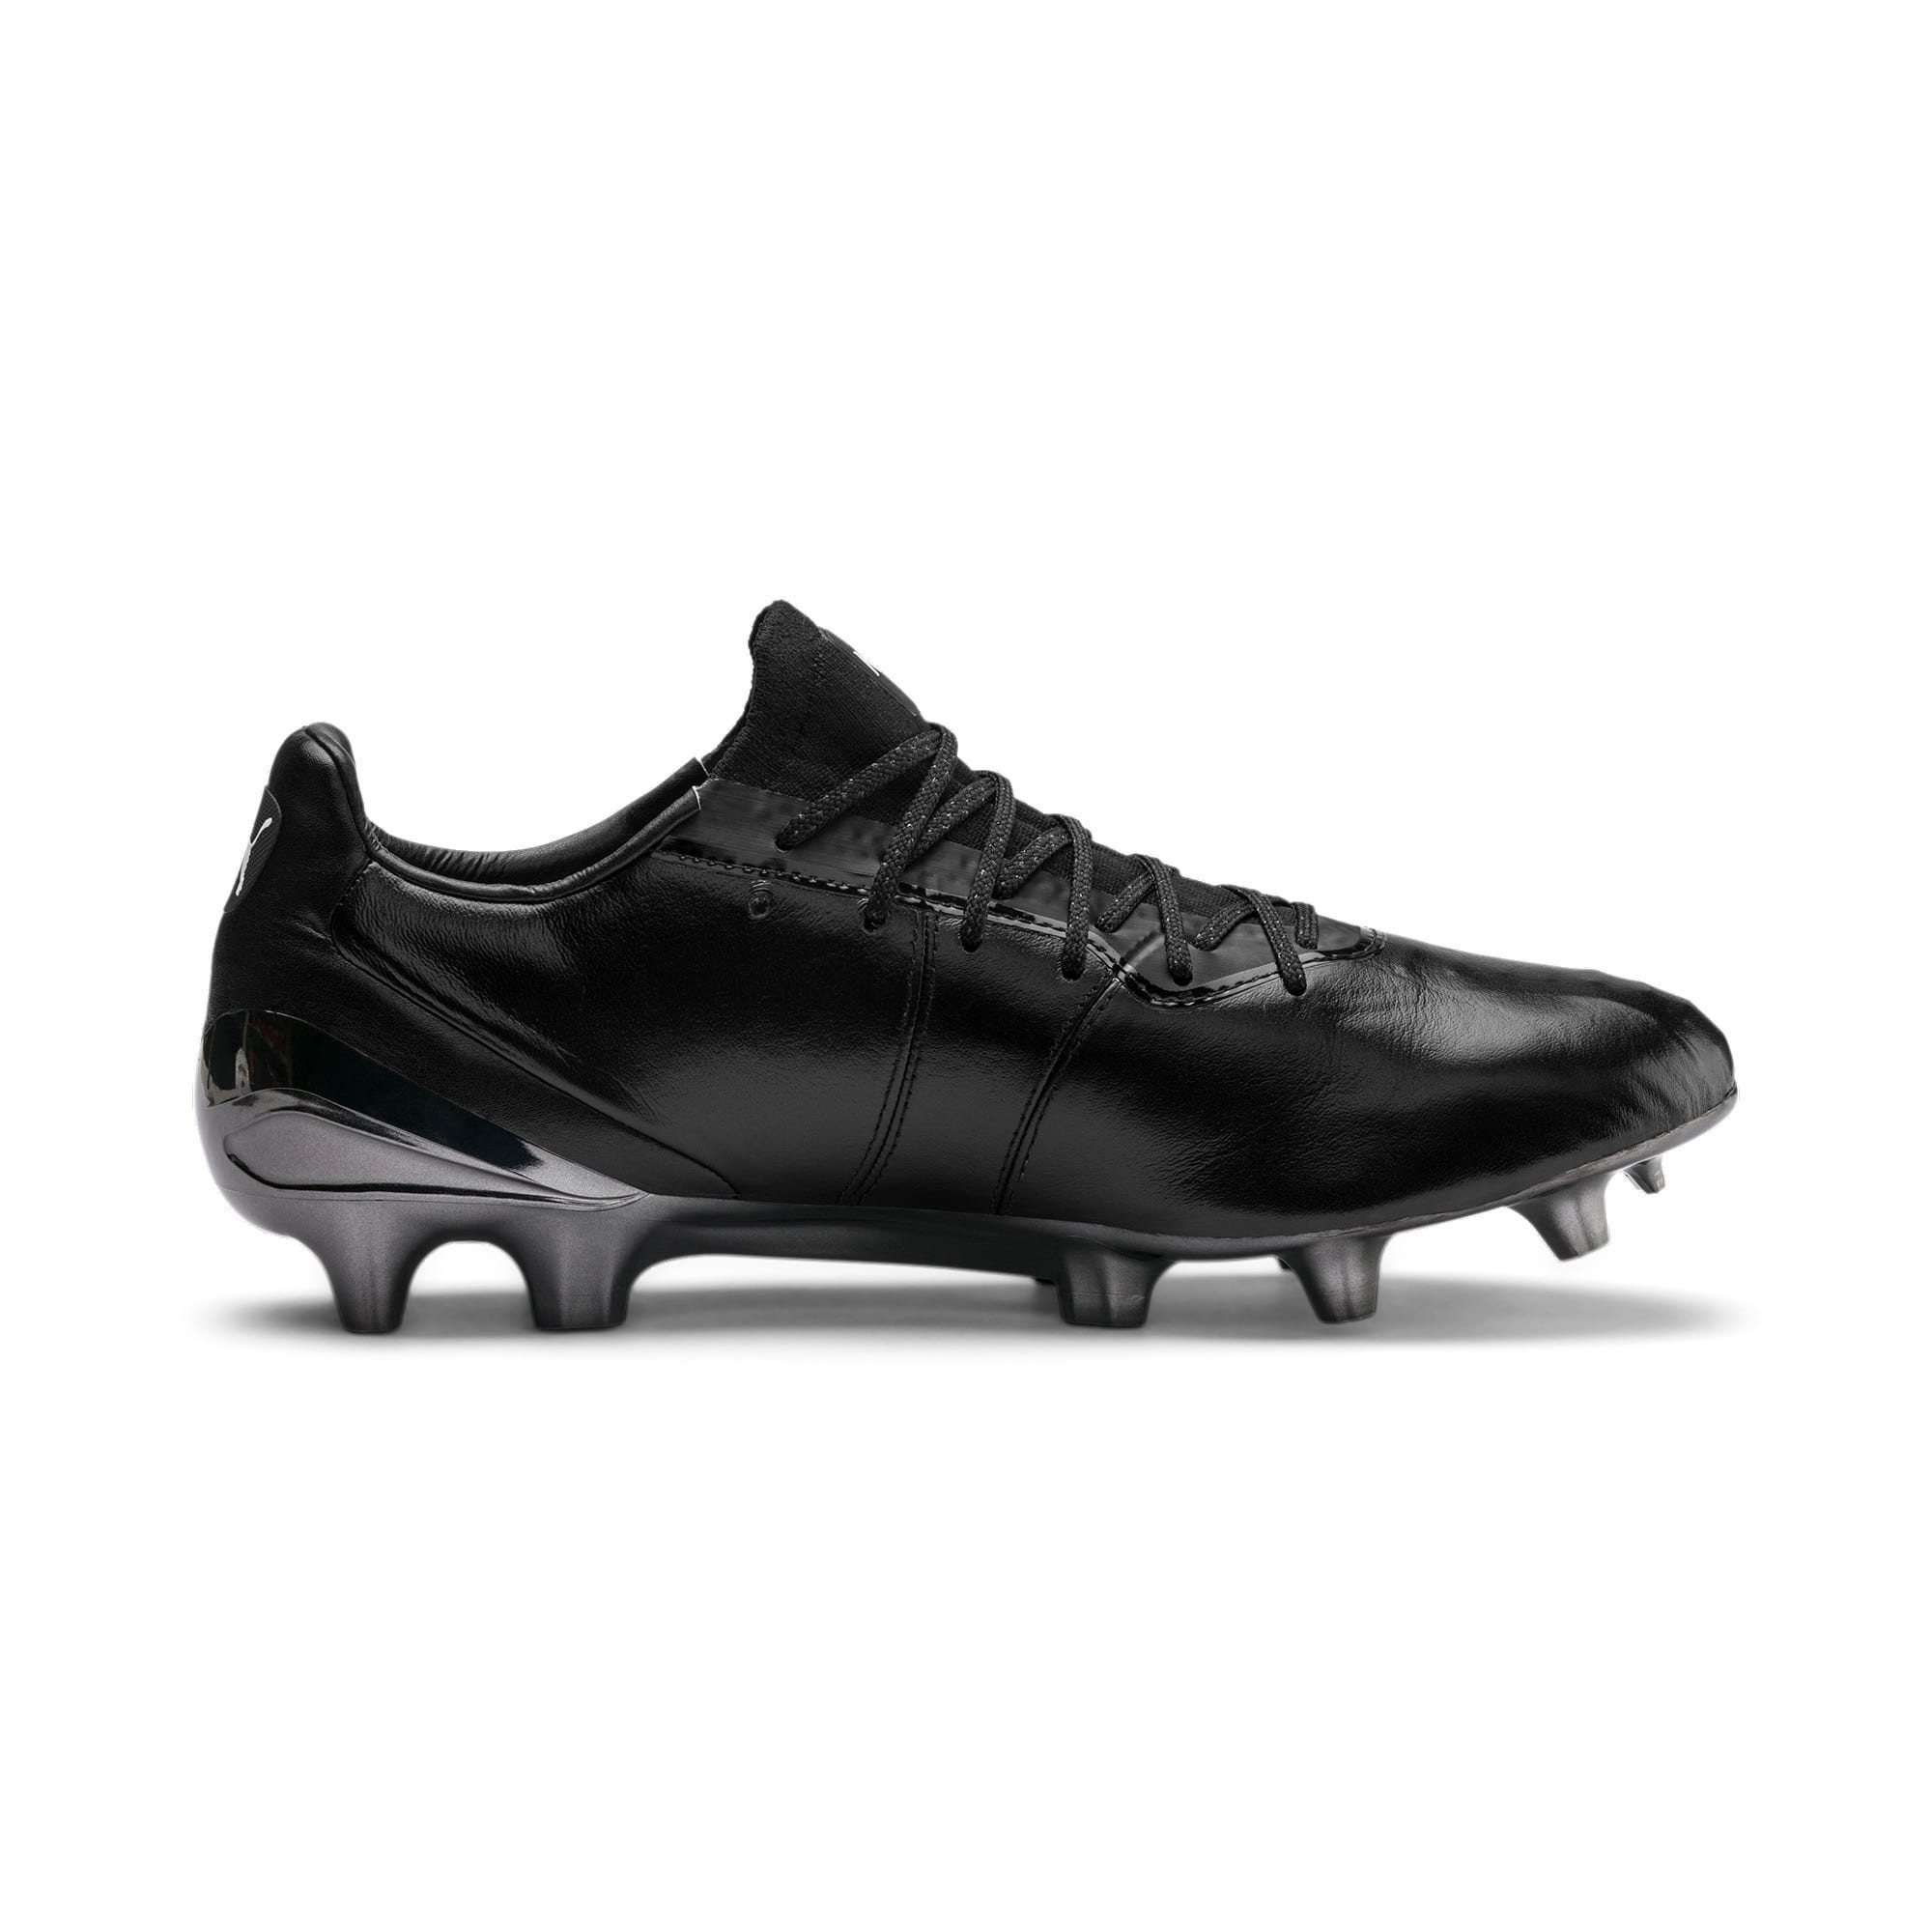 Thumbnail 6 of King Platinum FG/AG Men's Soccer Cleats, Puma Black-Puma White, medium